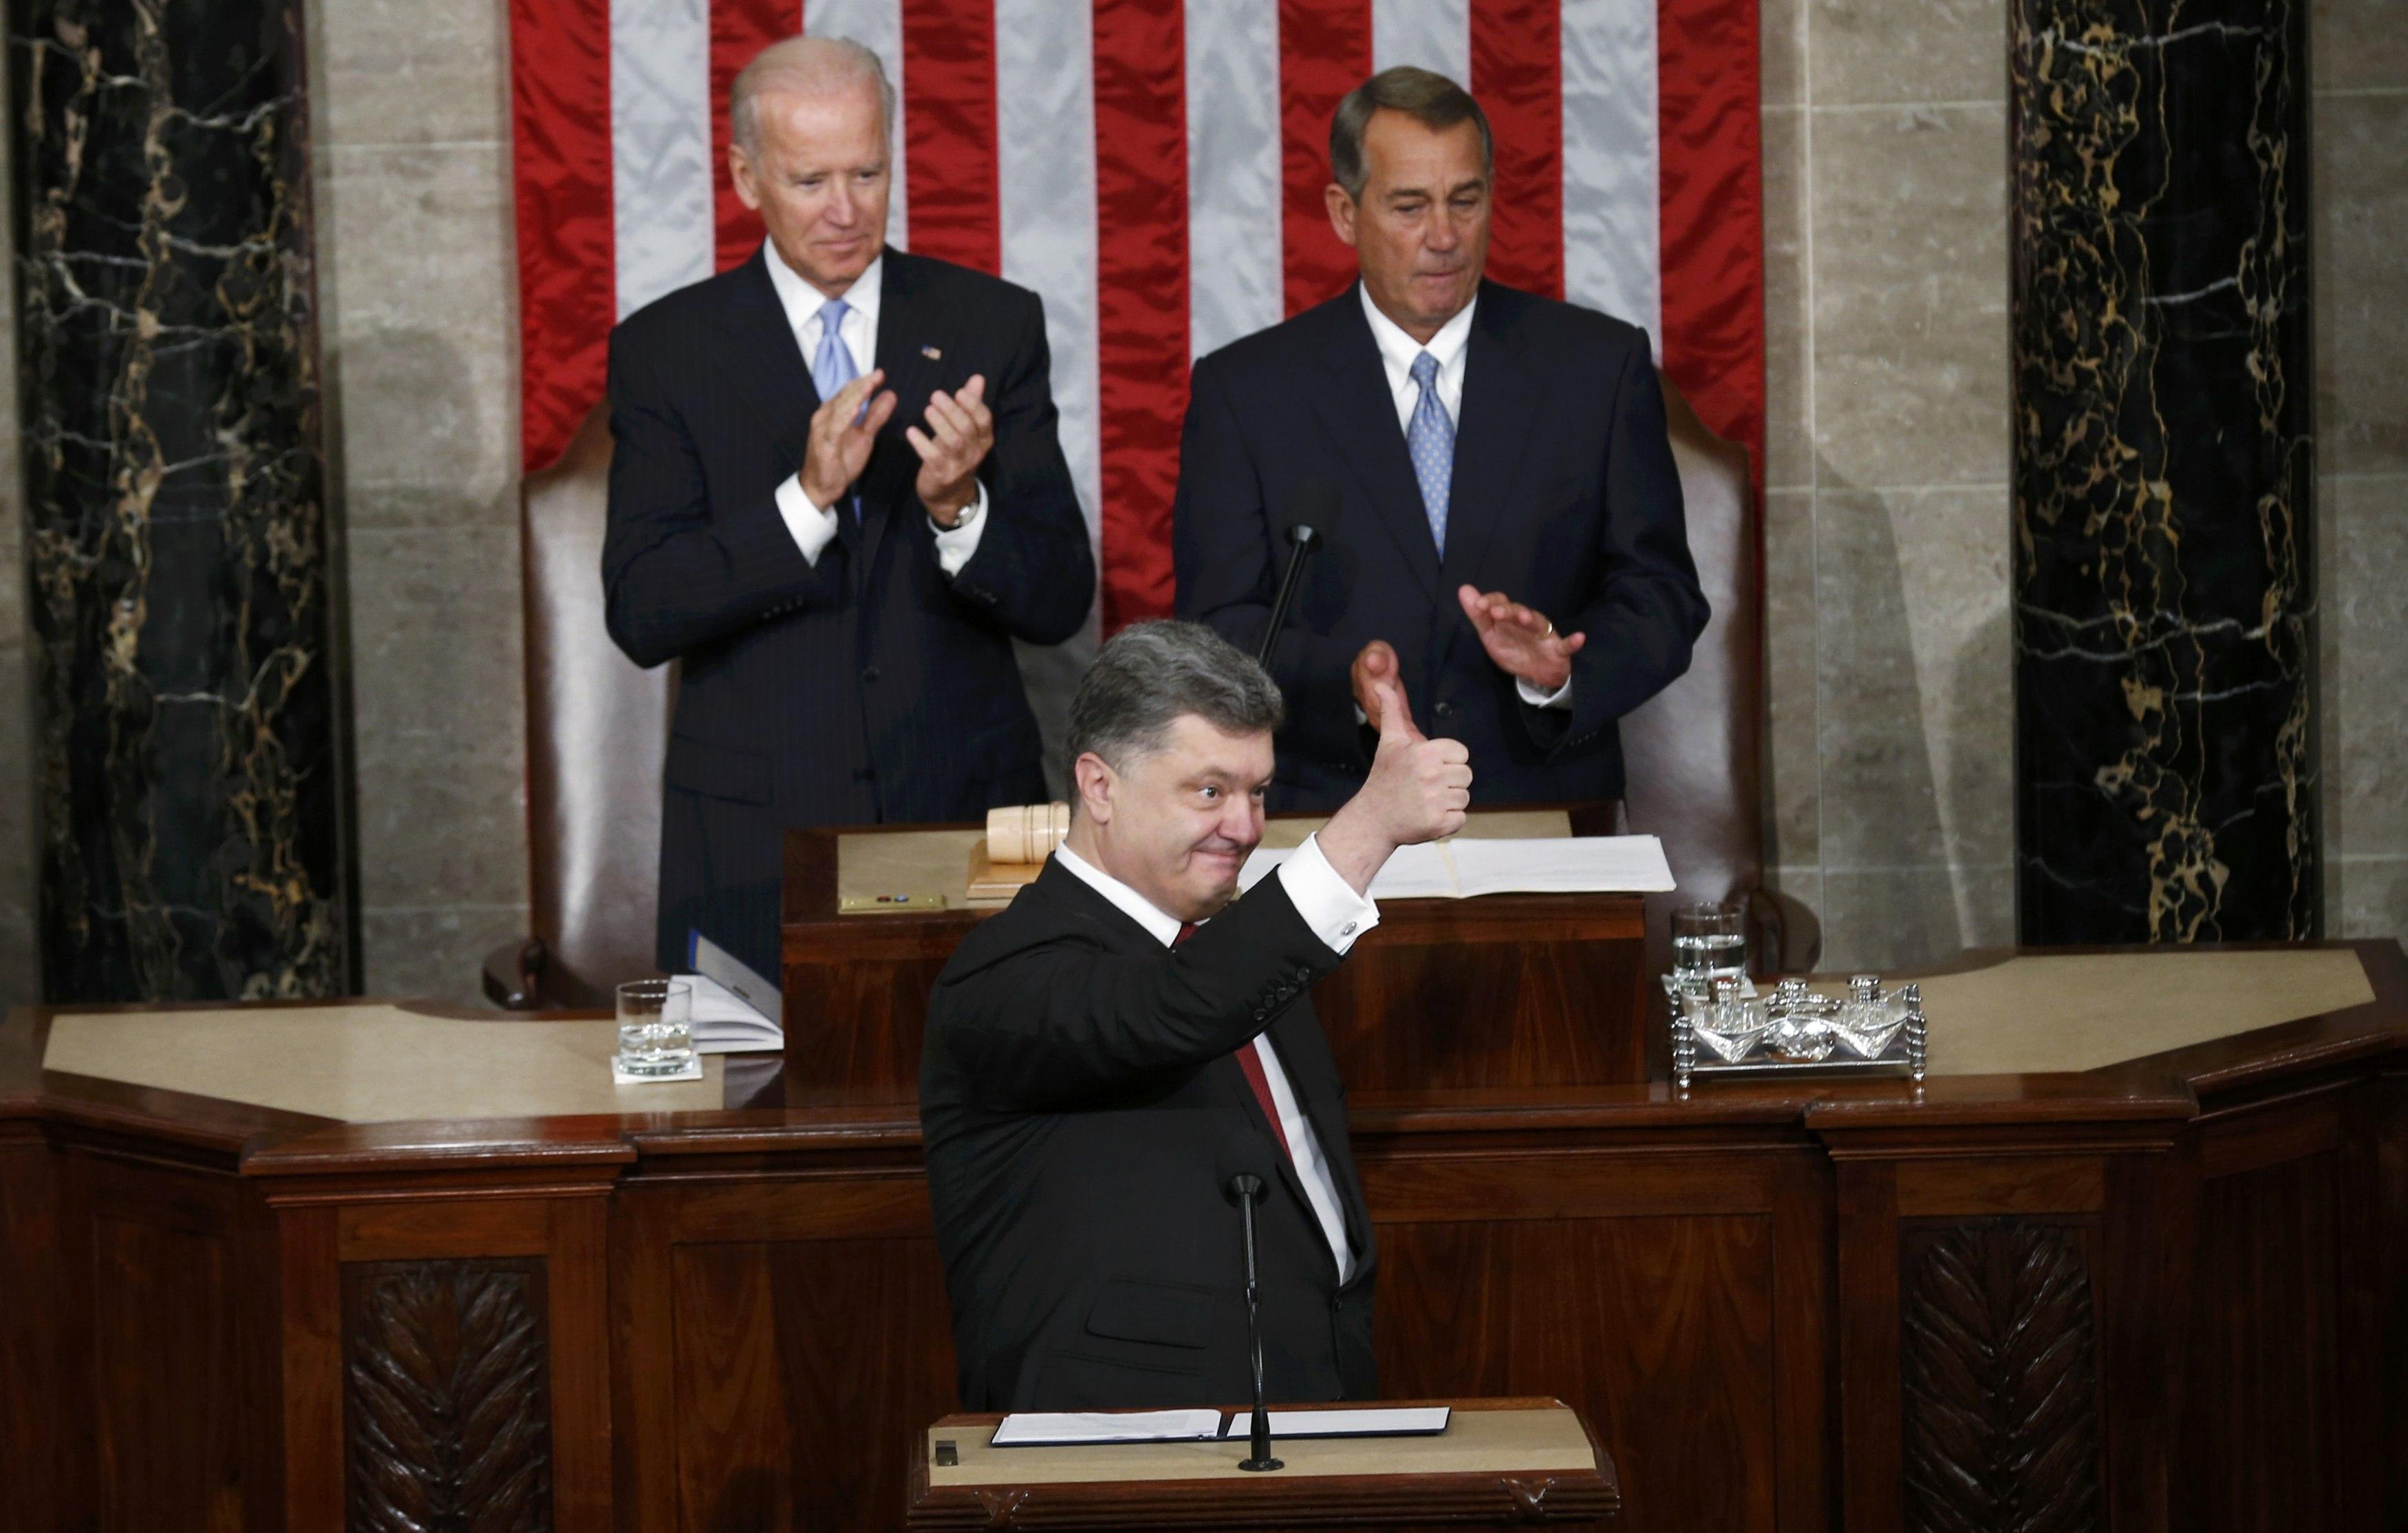 Obama, Ukraine president to meet at White House